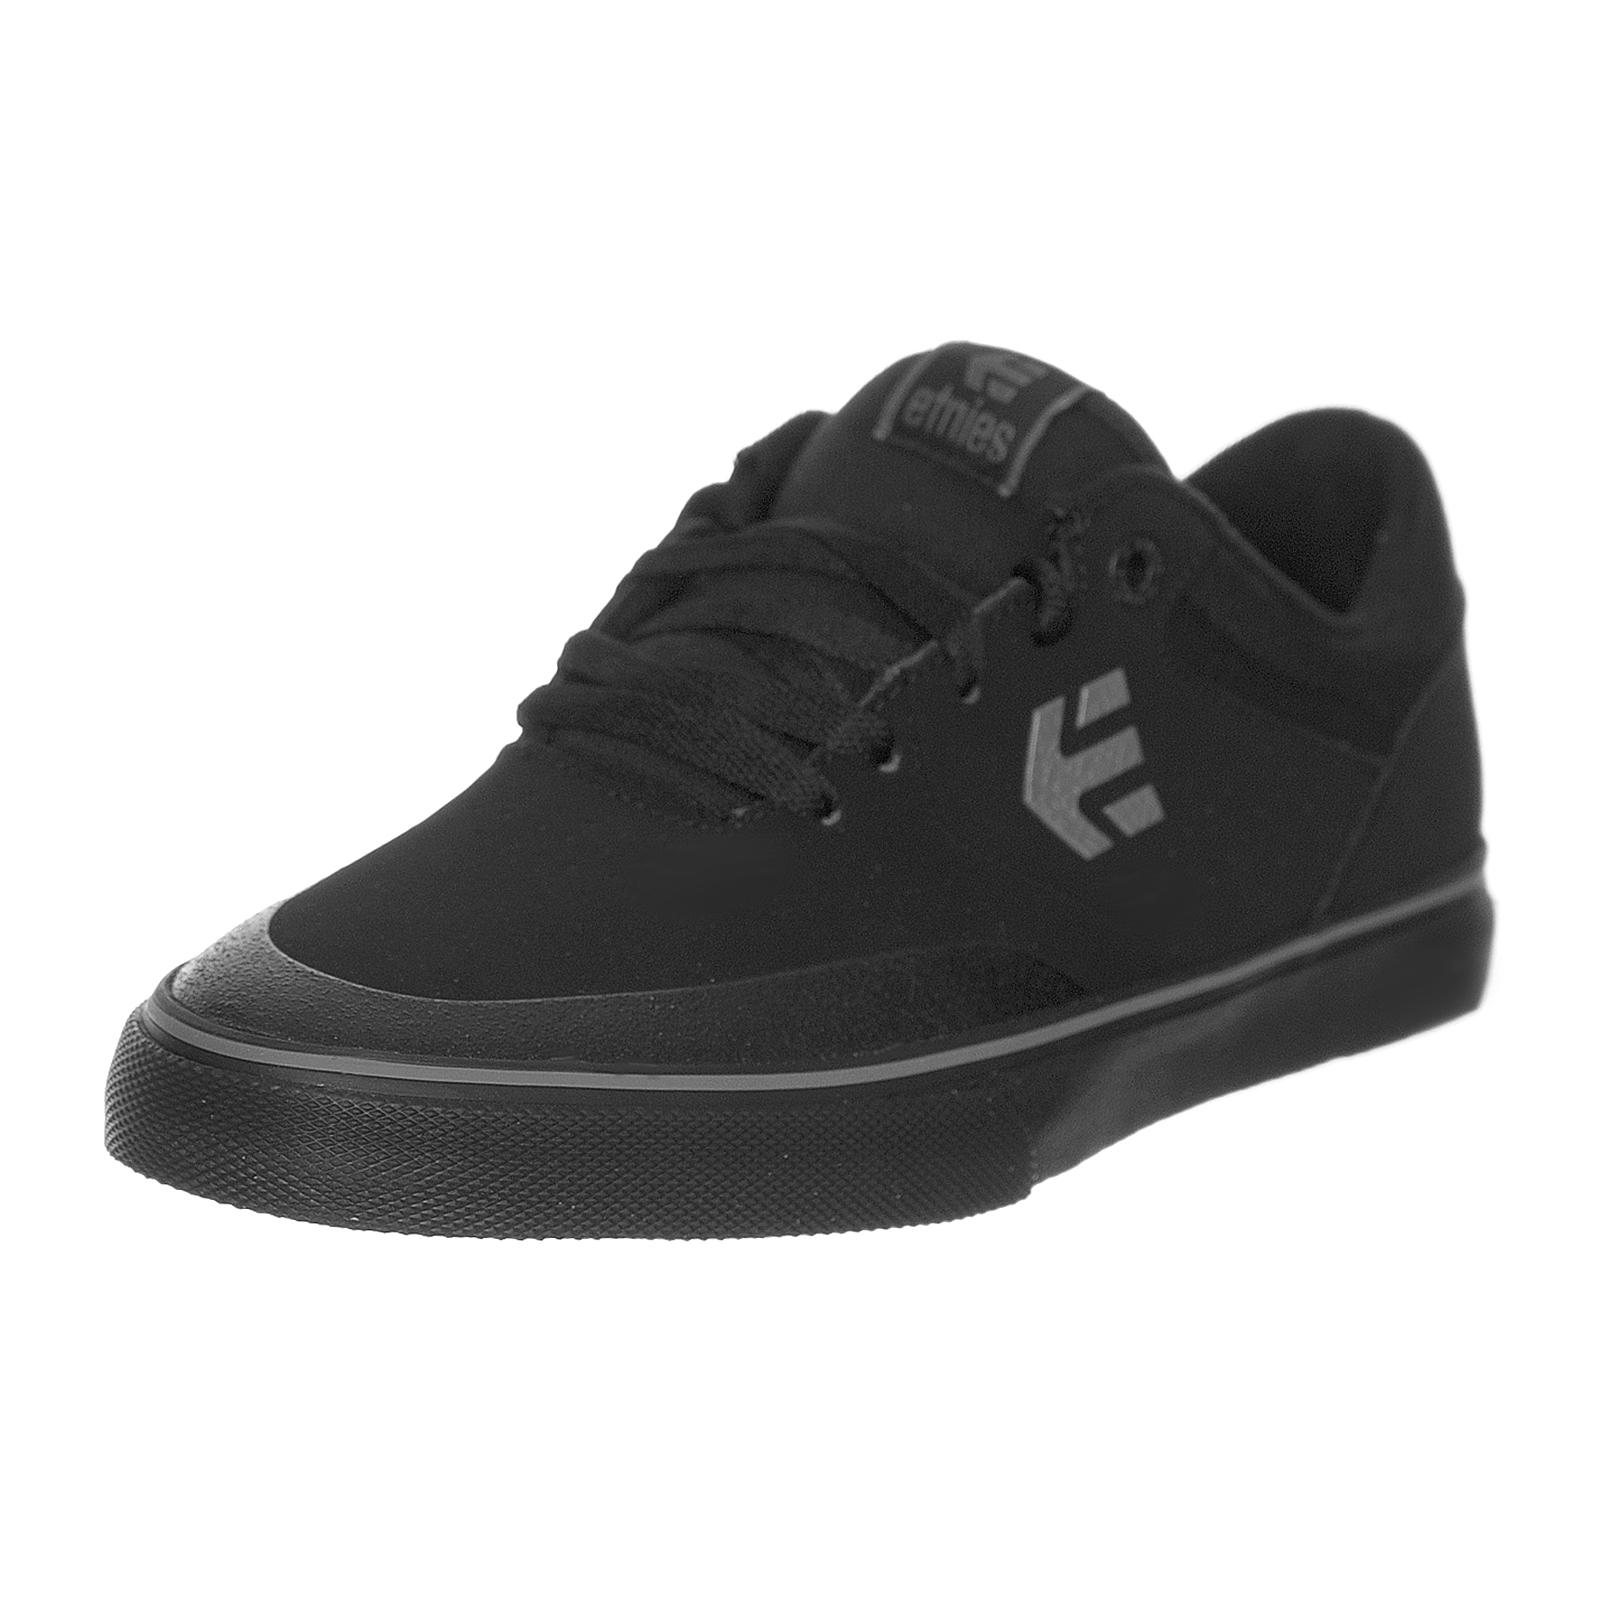 Etnies zapatillas Marana Vulc negro Dark gris negro